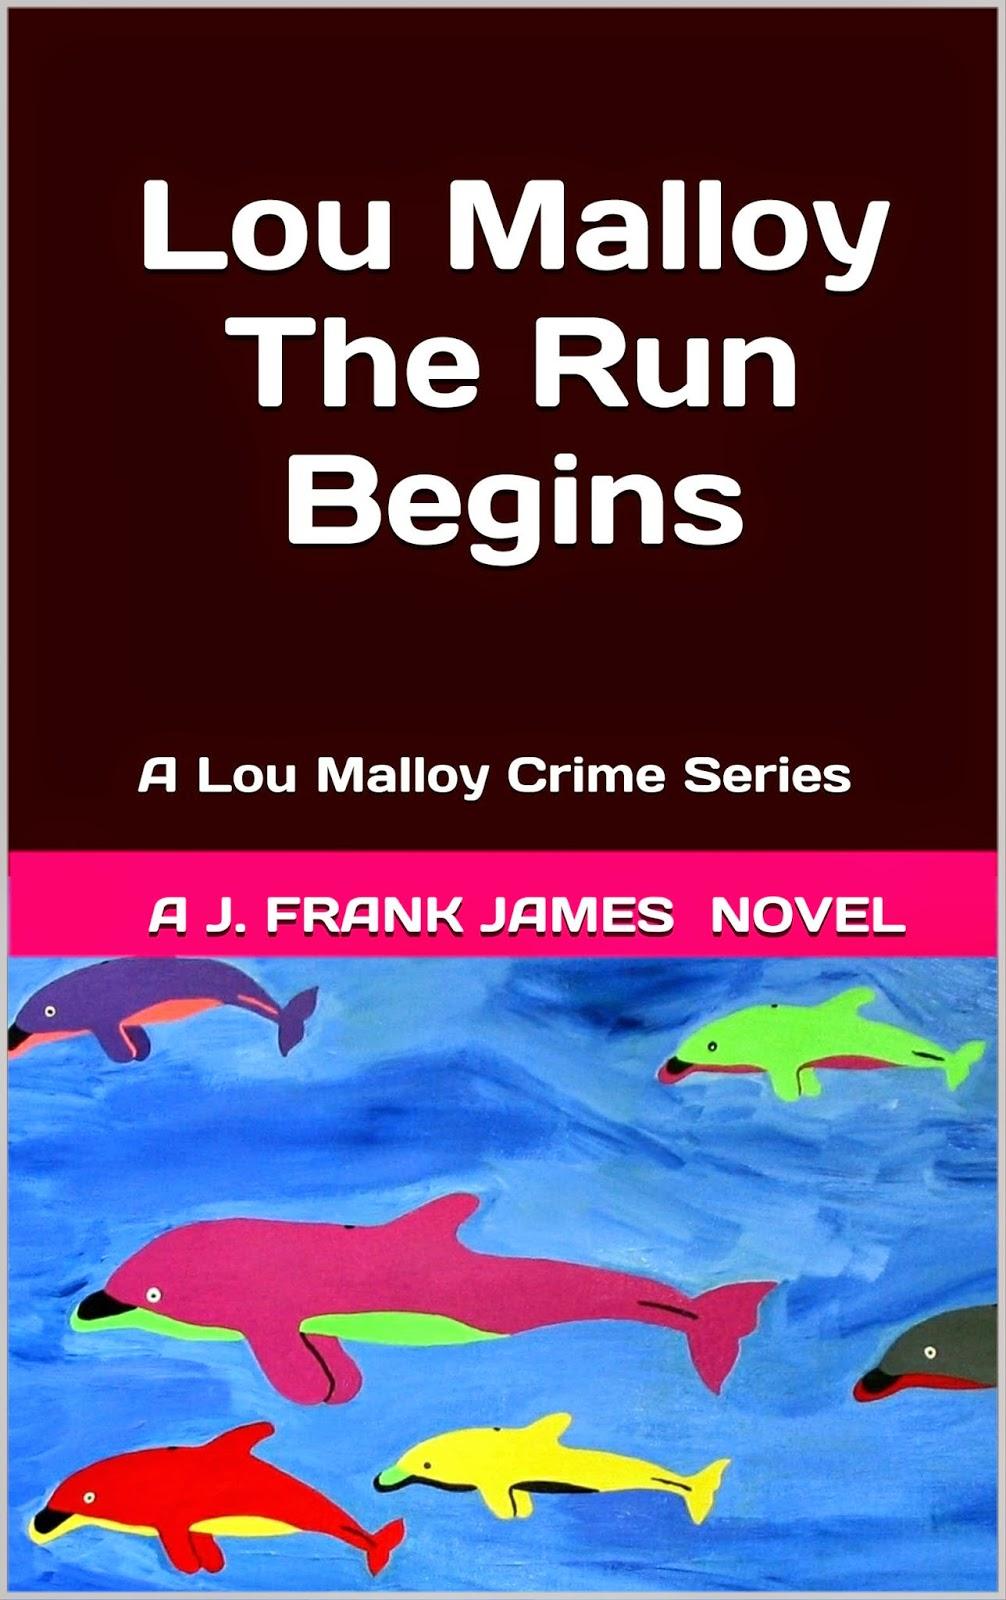 https://www.goodreads.com/book/show/20324885-lou-malloy